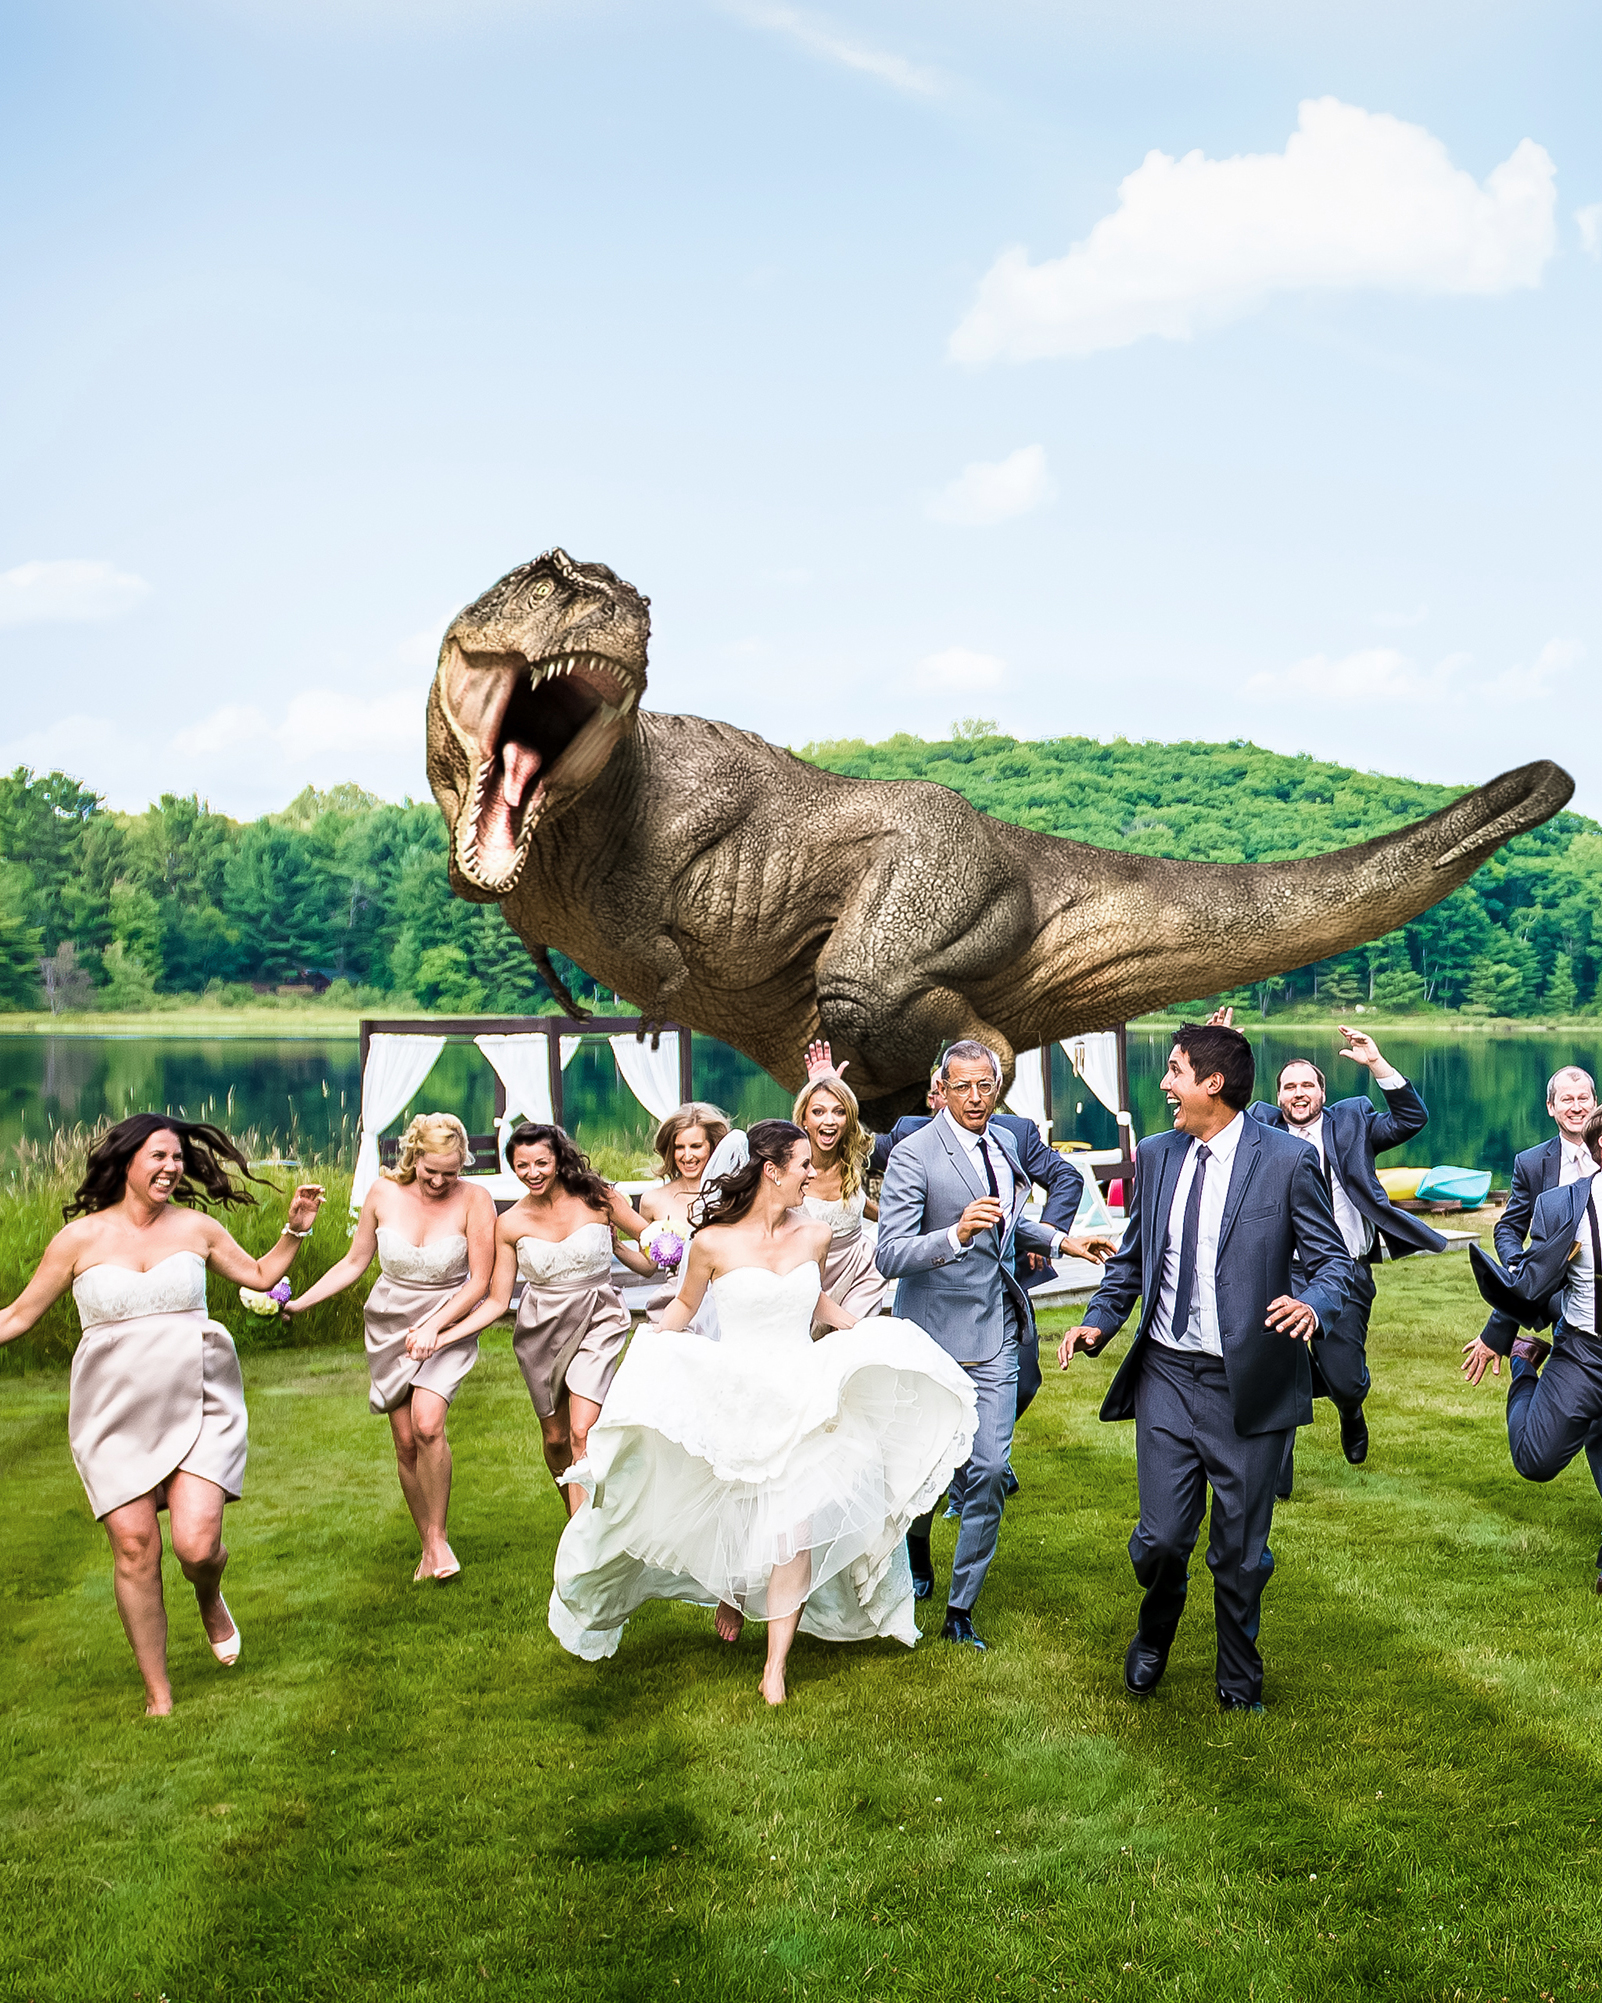 year-in-weddings-jurassic-park-jeff-goldblum-1-1214.jpg